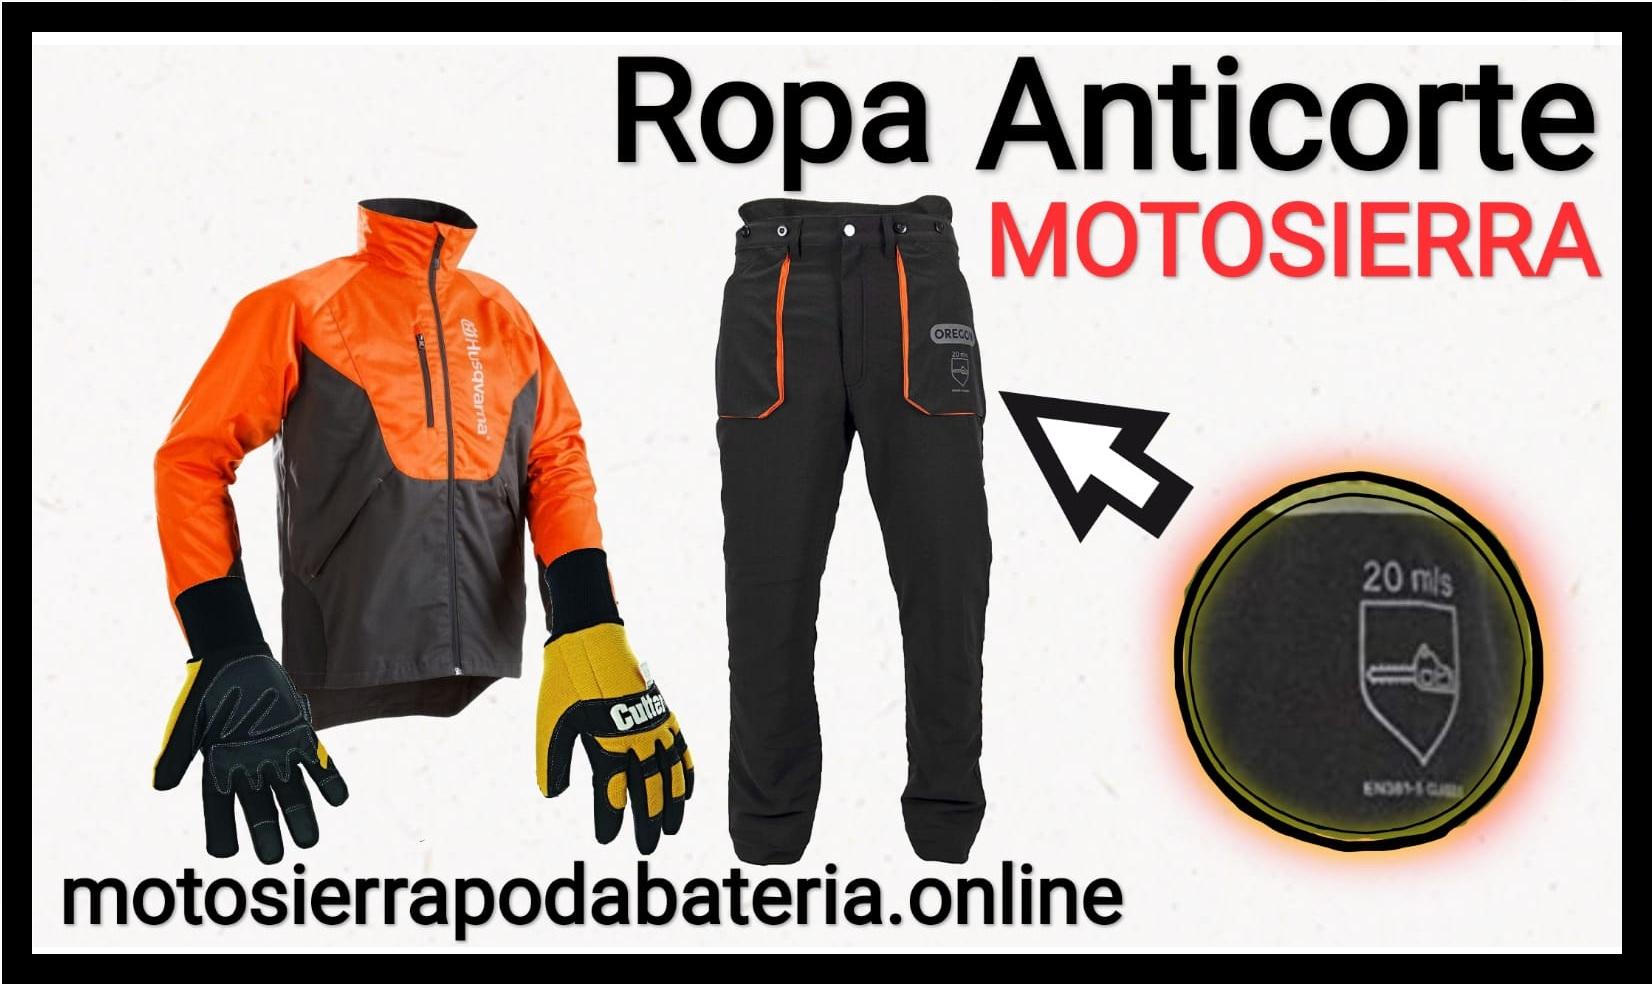 Mejor ropa anticorte motosierra